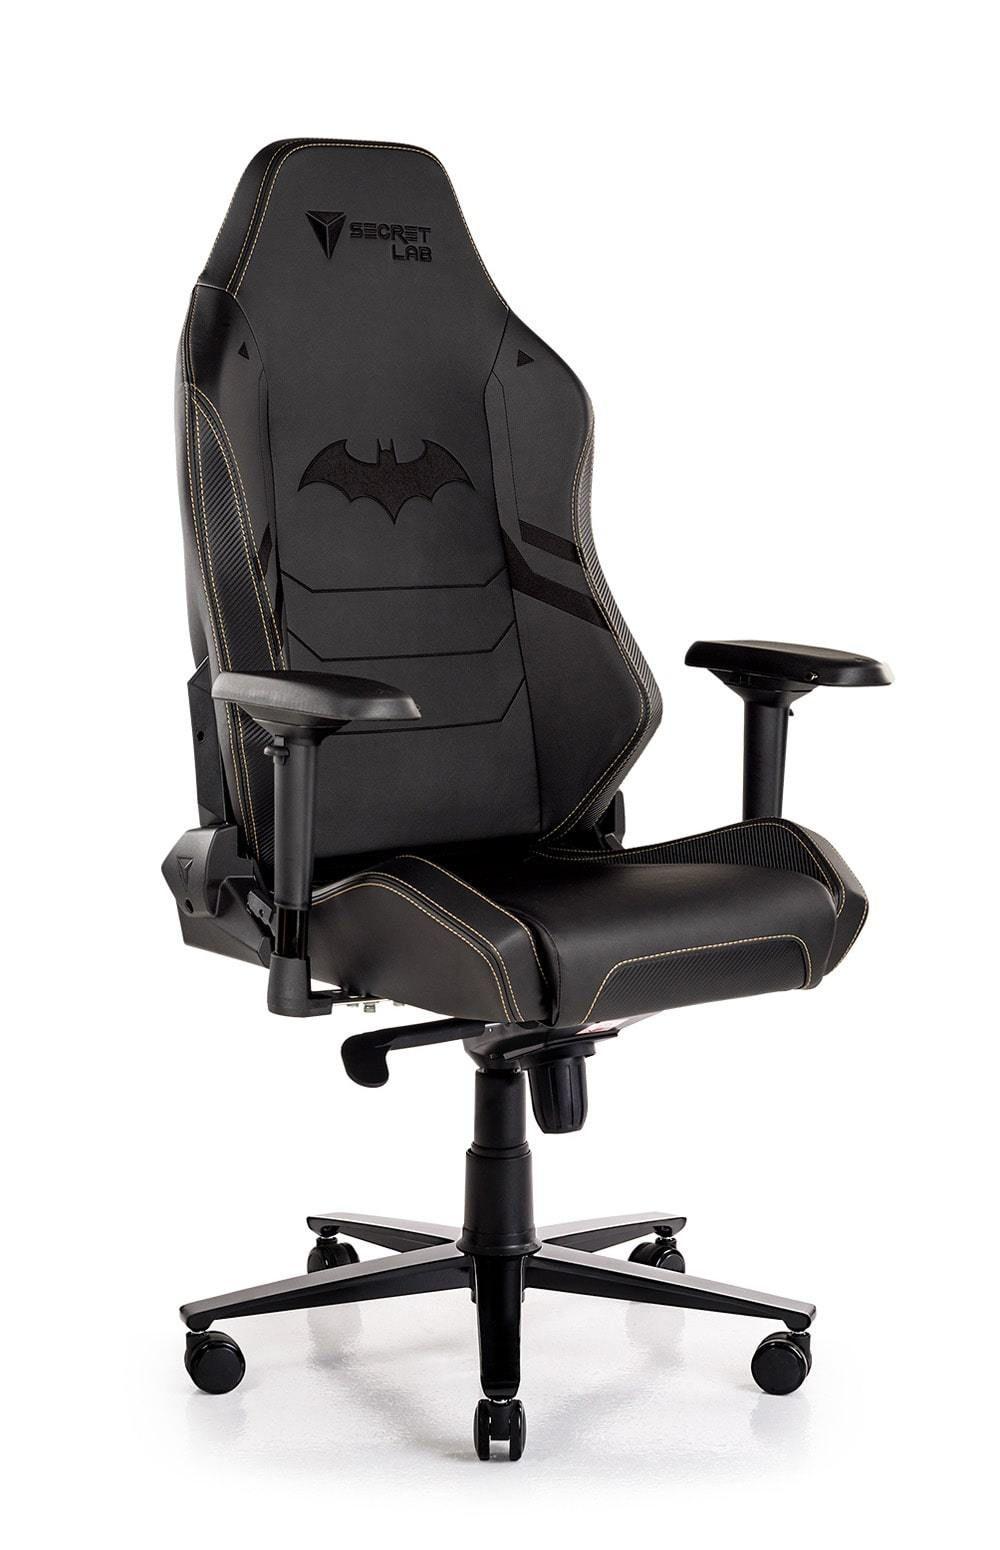 Omega Series Gaming Chairs Secretlab Us In 2020 Traditional Office Chairs Gaming Chair Office Chair